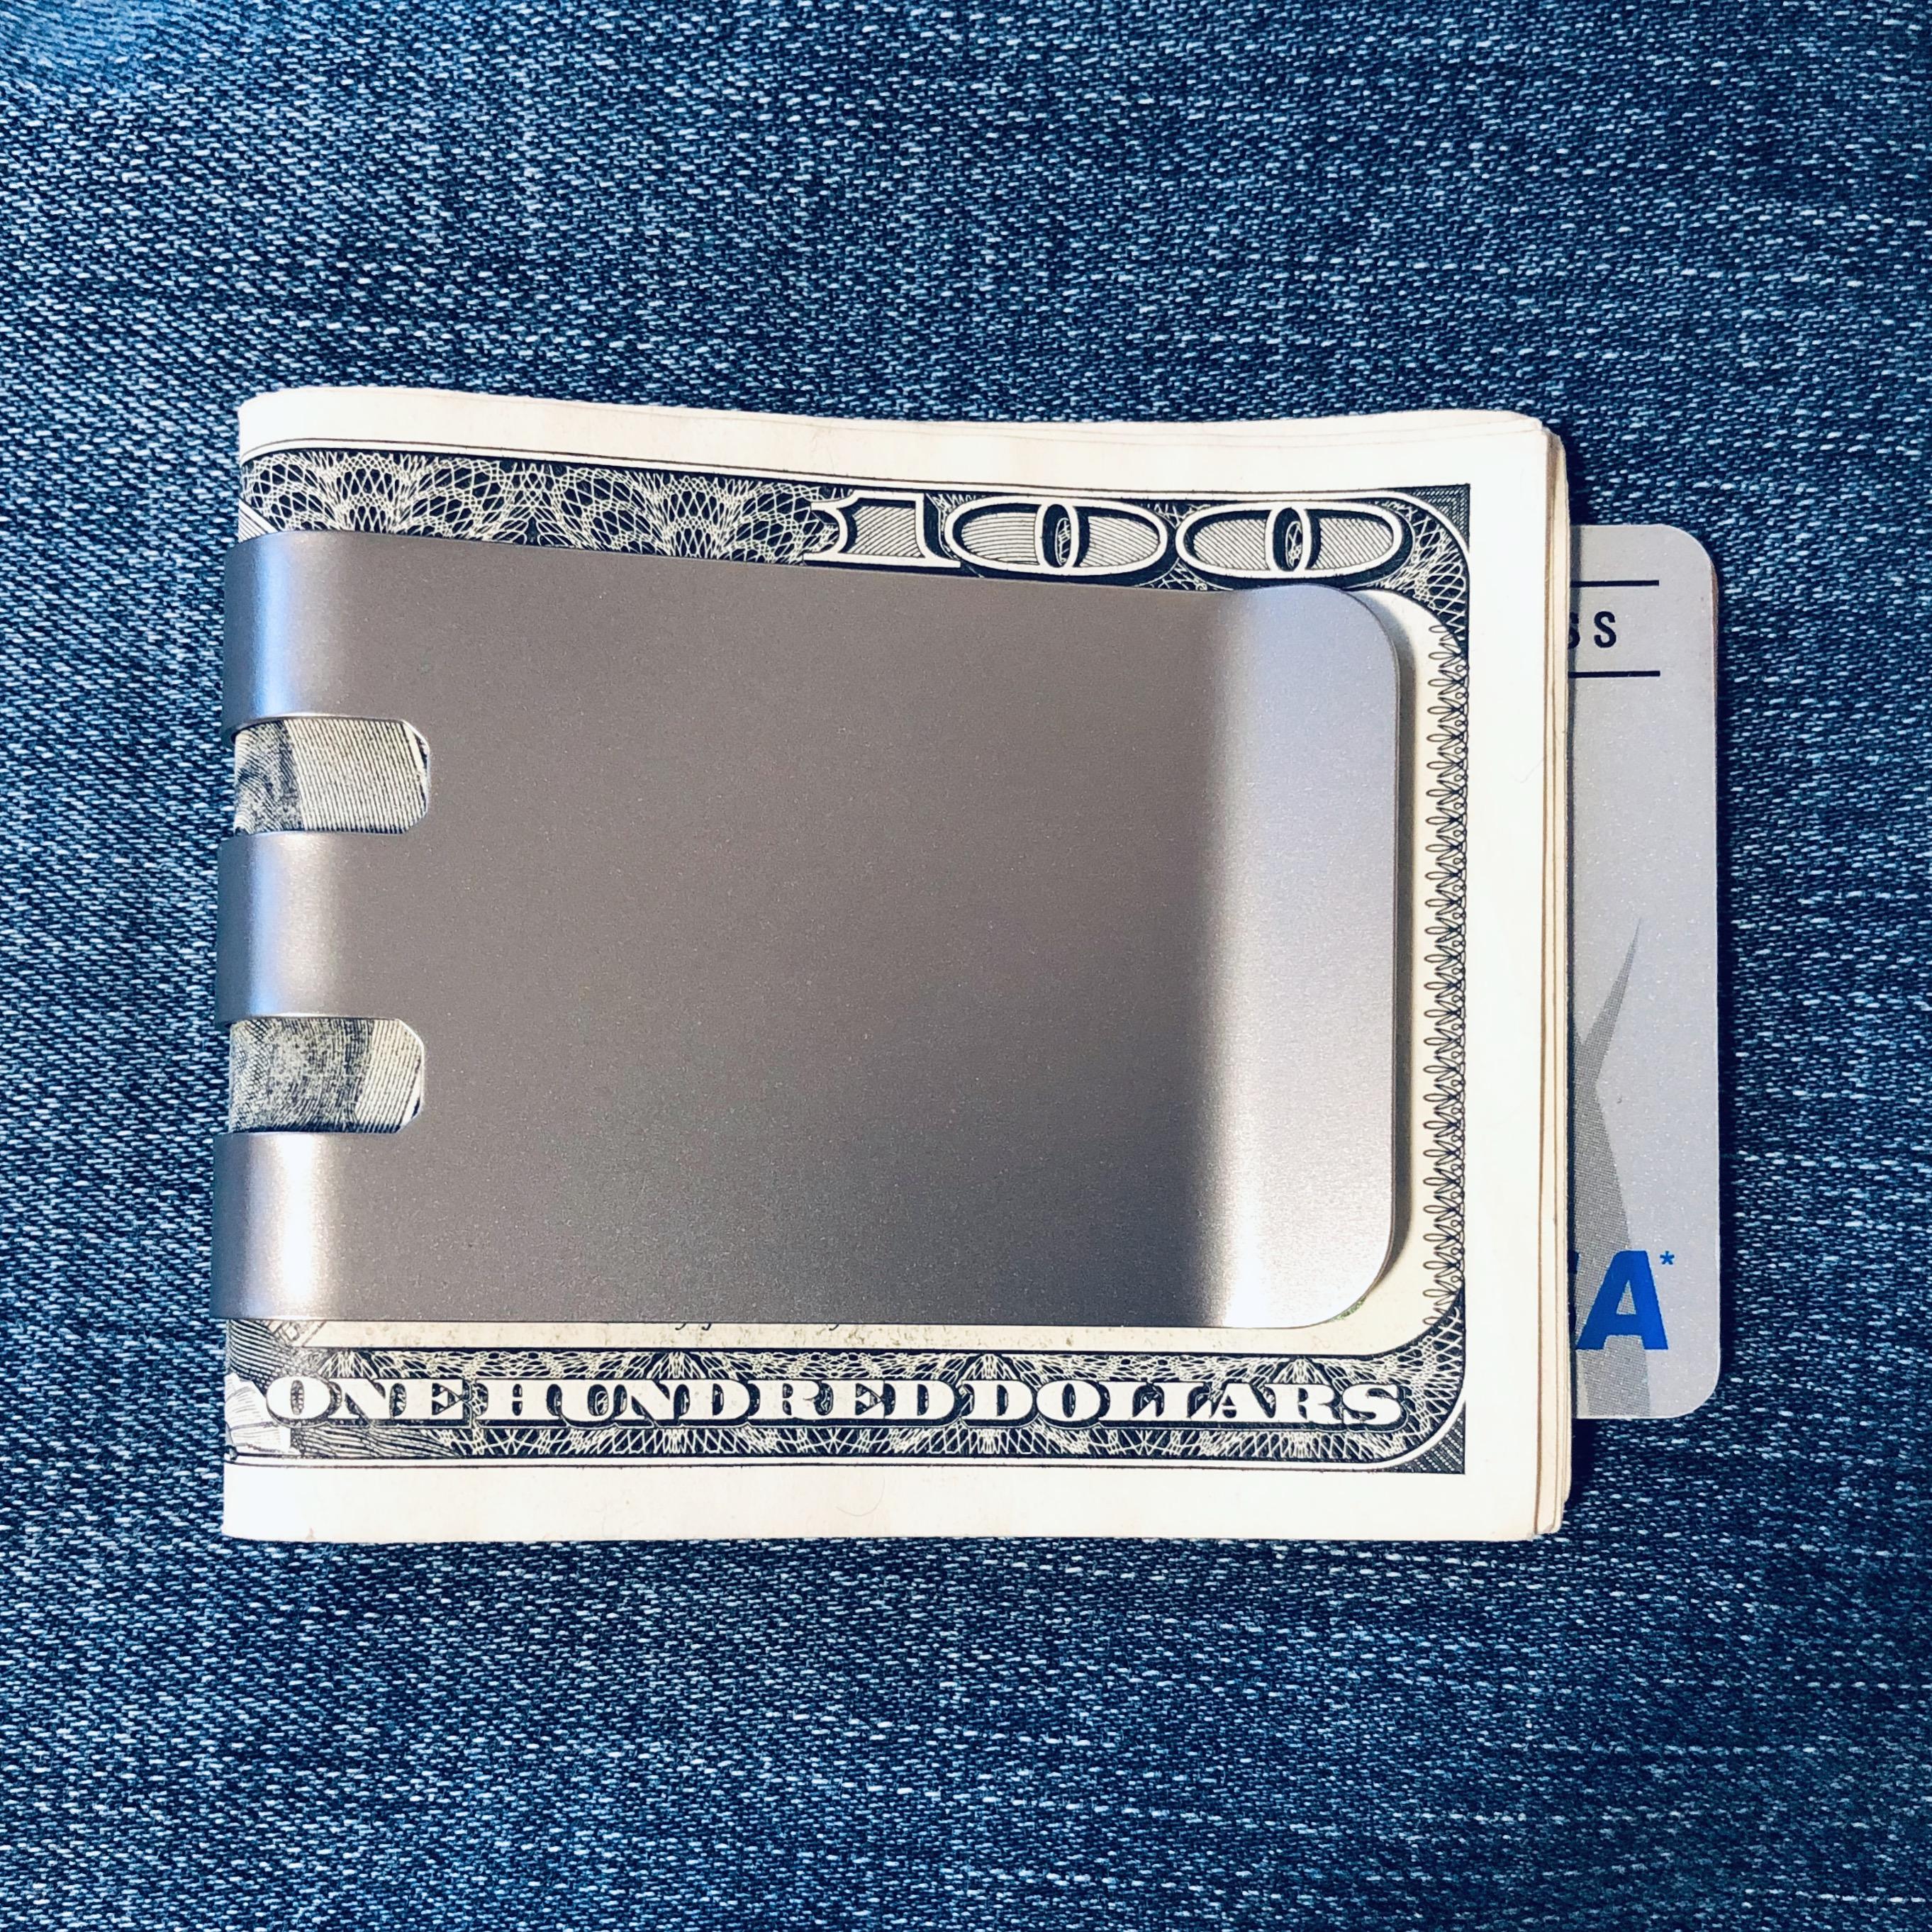 NEW!! COMMANDER™ 2.0 Money Clip - Massive 60 folded bill capacity - Natural Titanium Finish